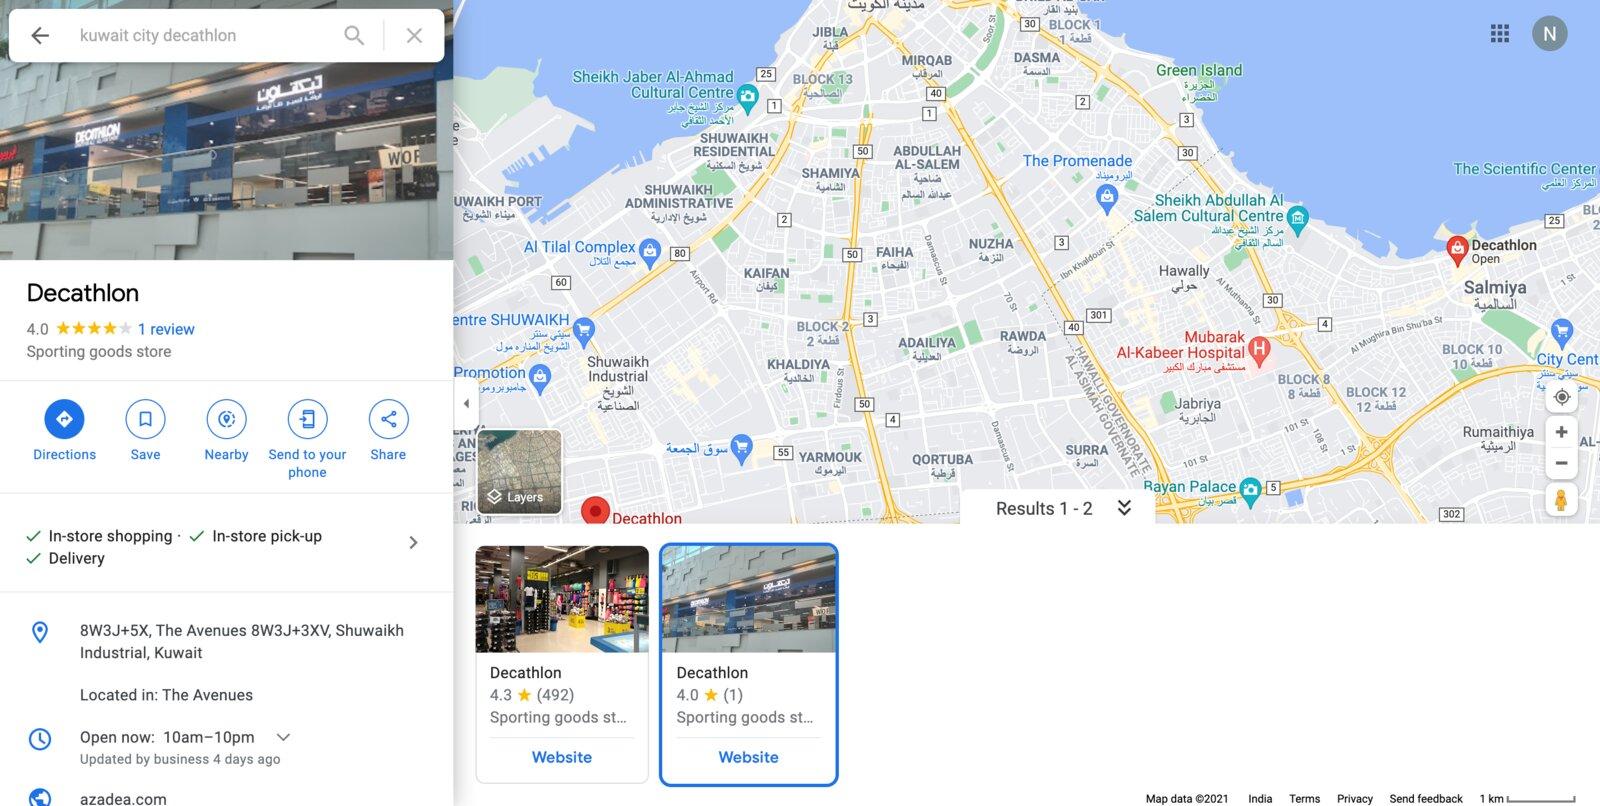 Decathlon-Google-Maps.jpg